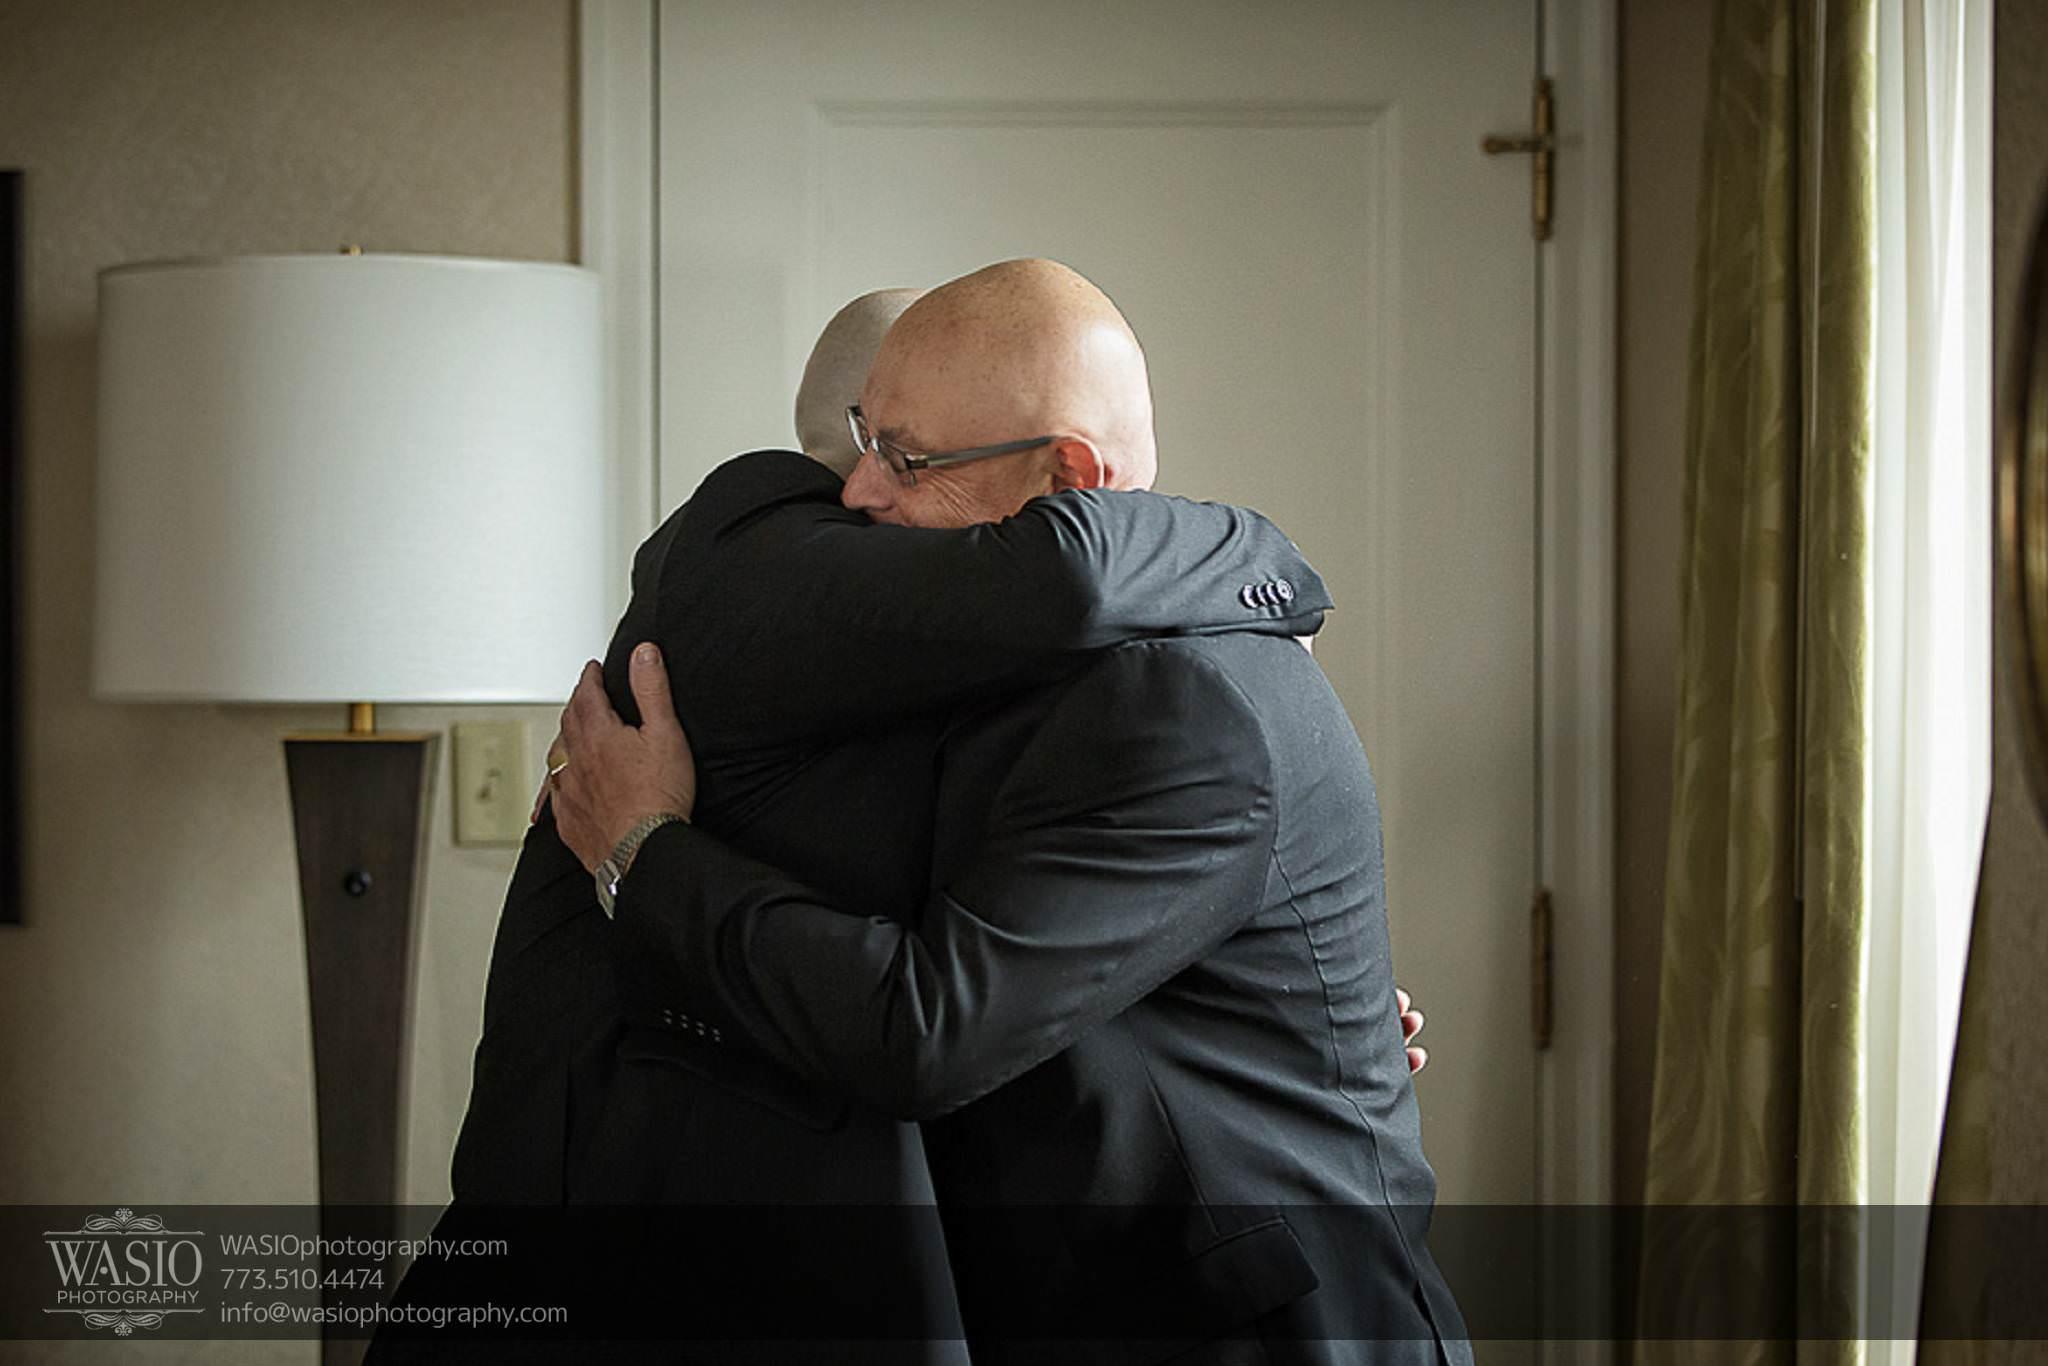 Chicago-wedding-photos-intimate-moment-rare-hug-father-son-039 Chicago Wedding Photos - Svetlana + Yuriy